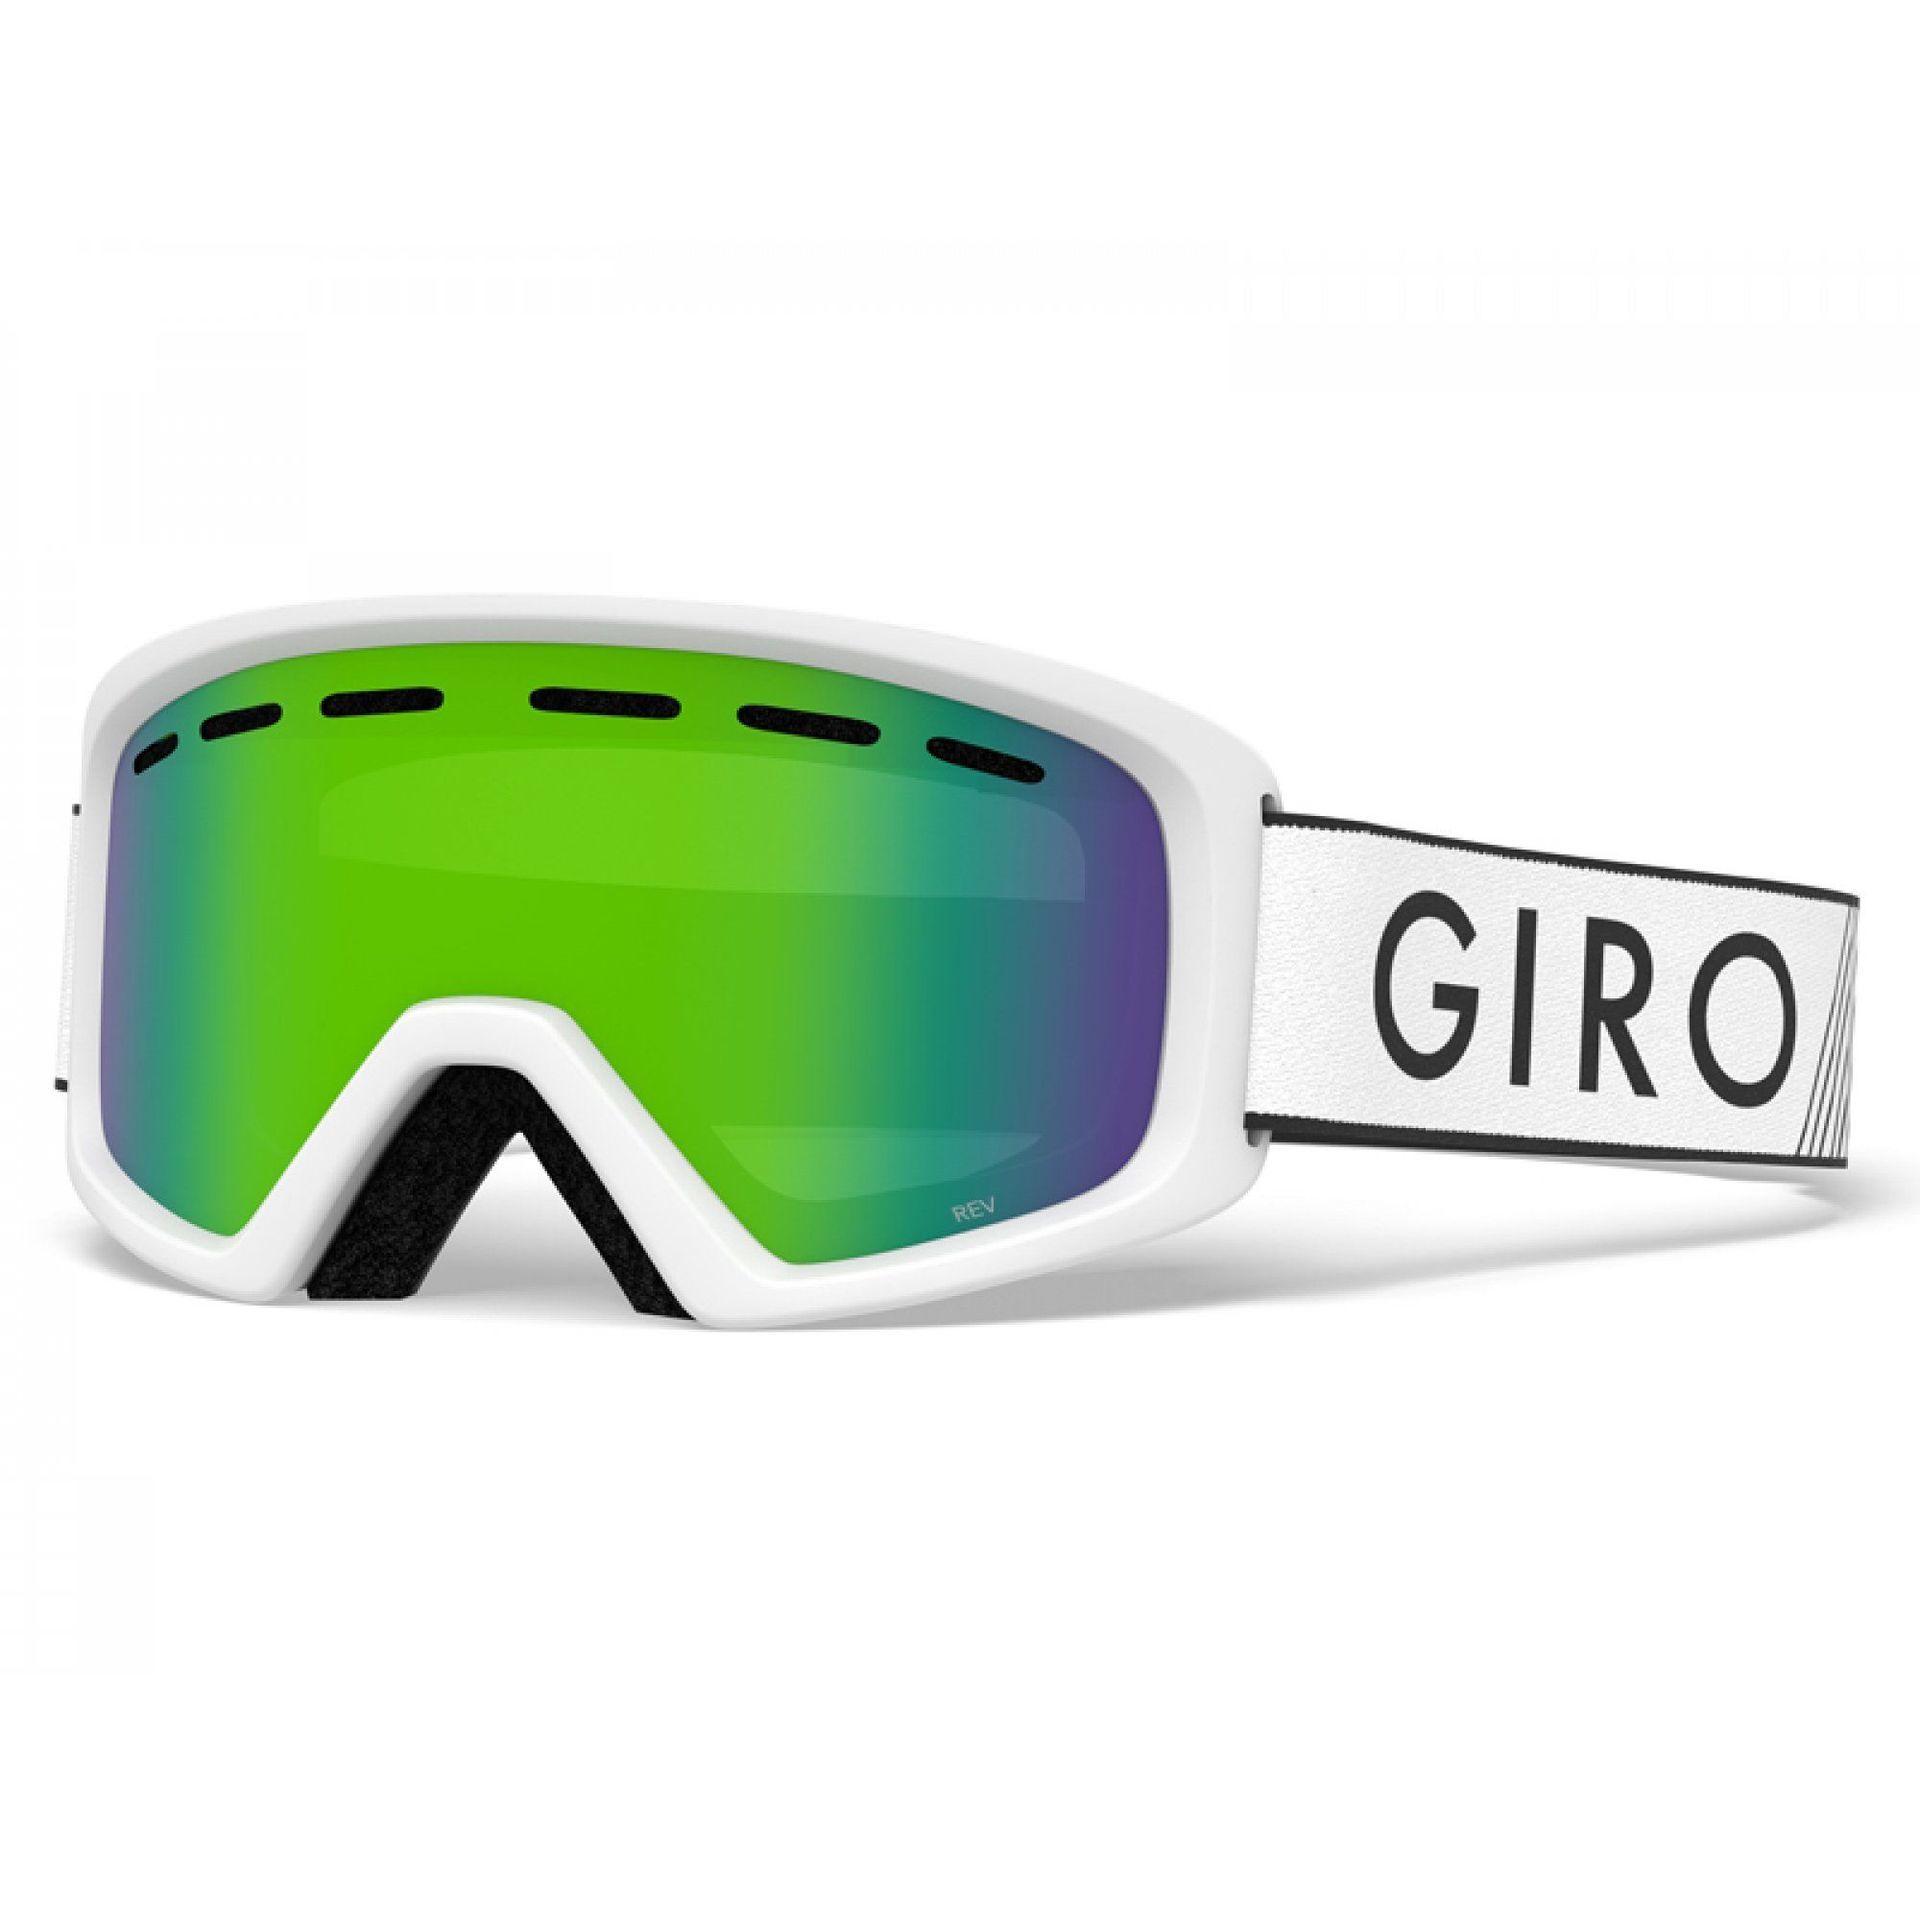 GOGLE GIRO REV WHITE ZOOM|LODEN GREEN 1